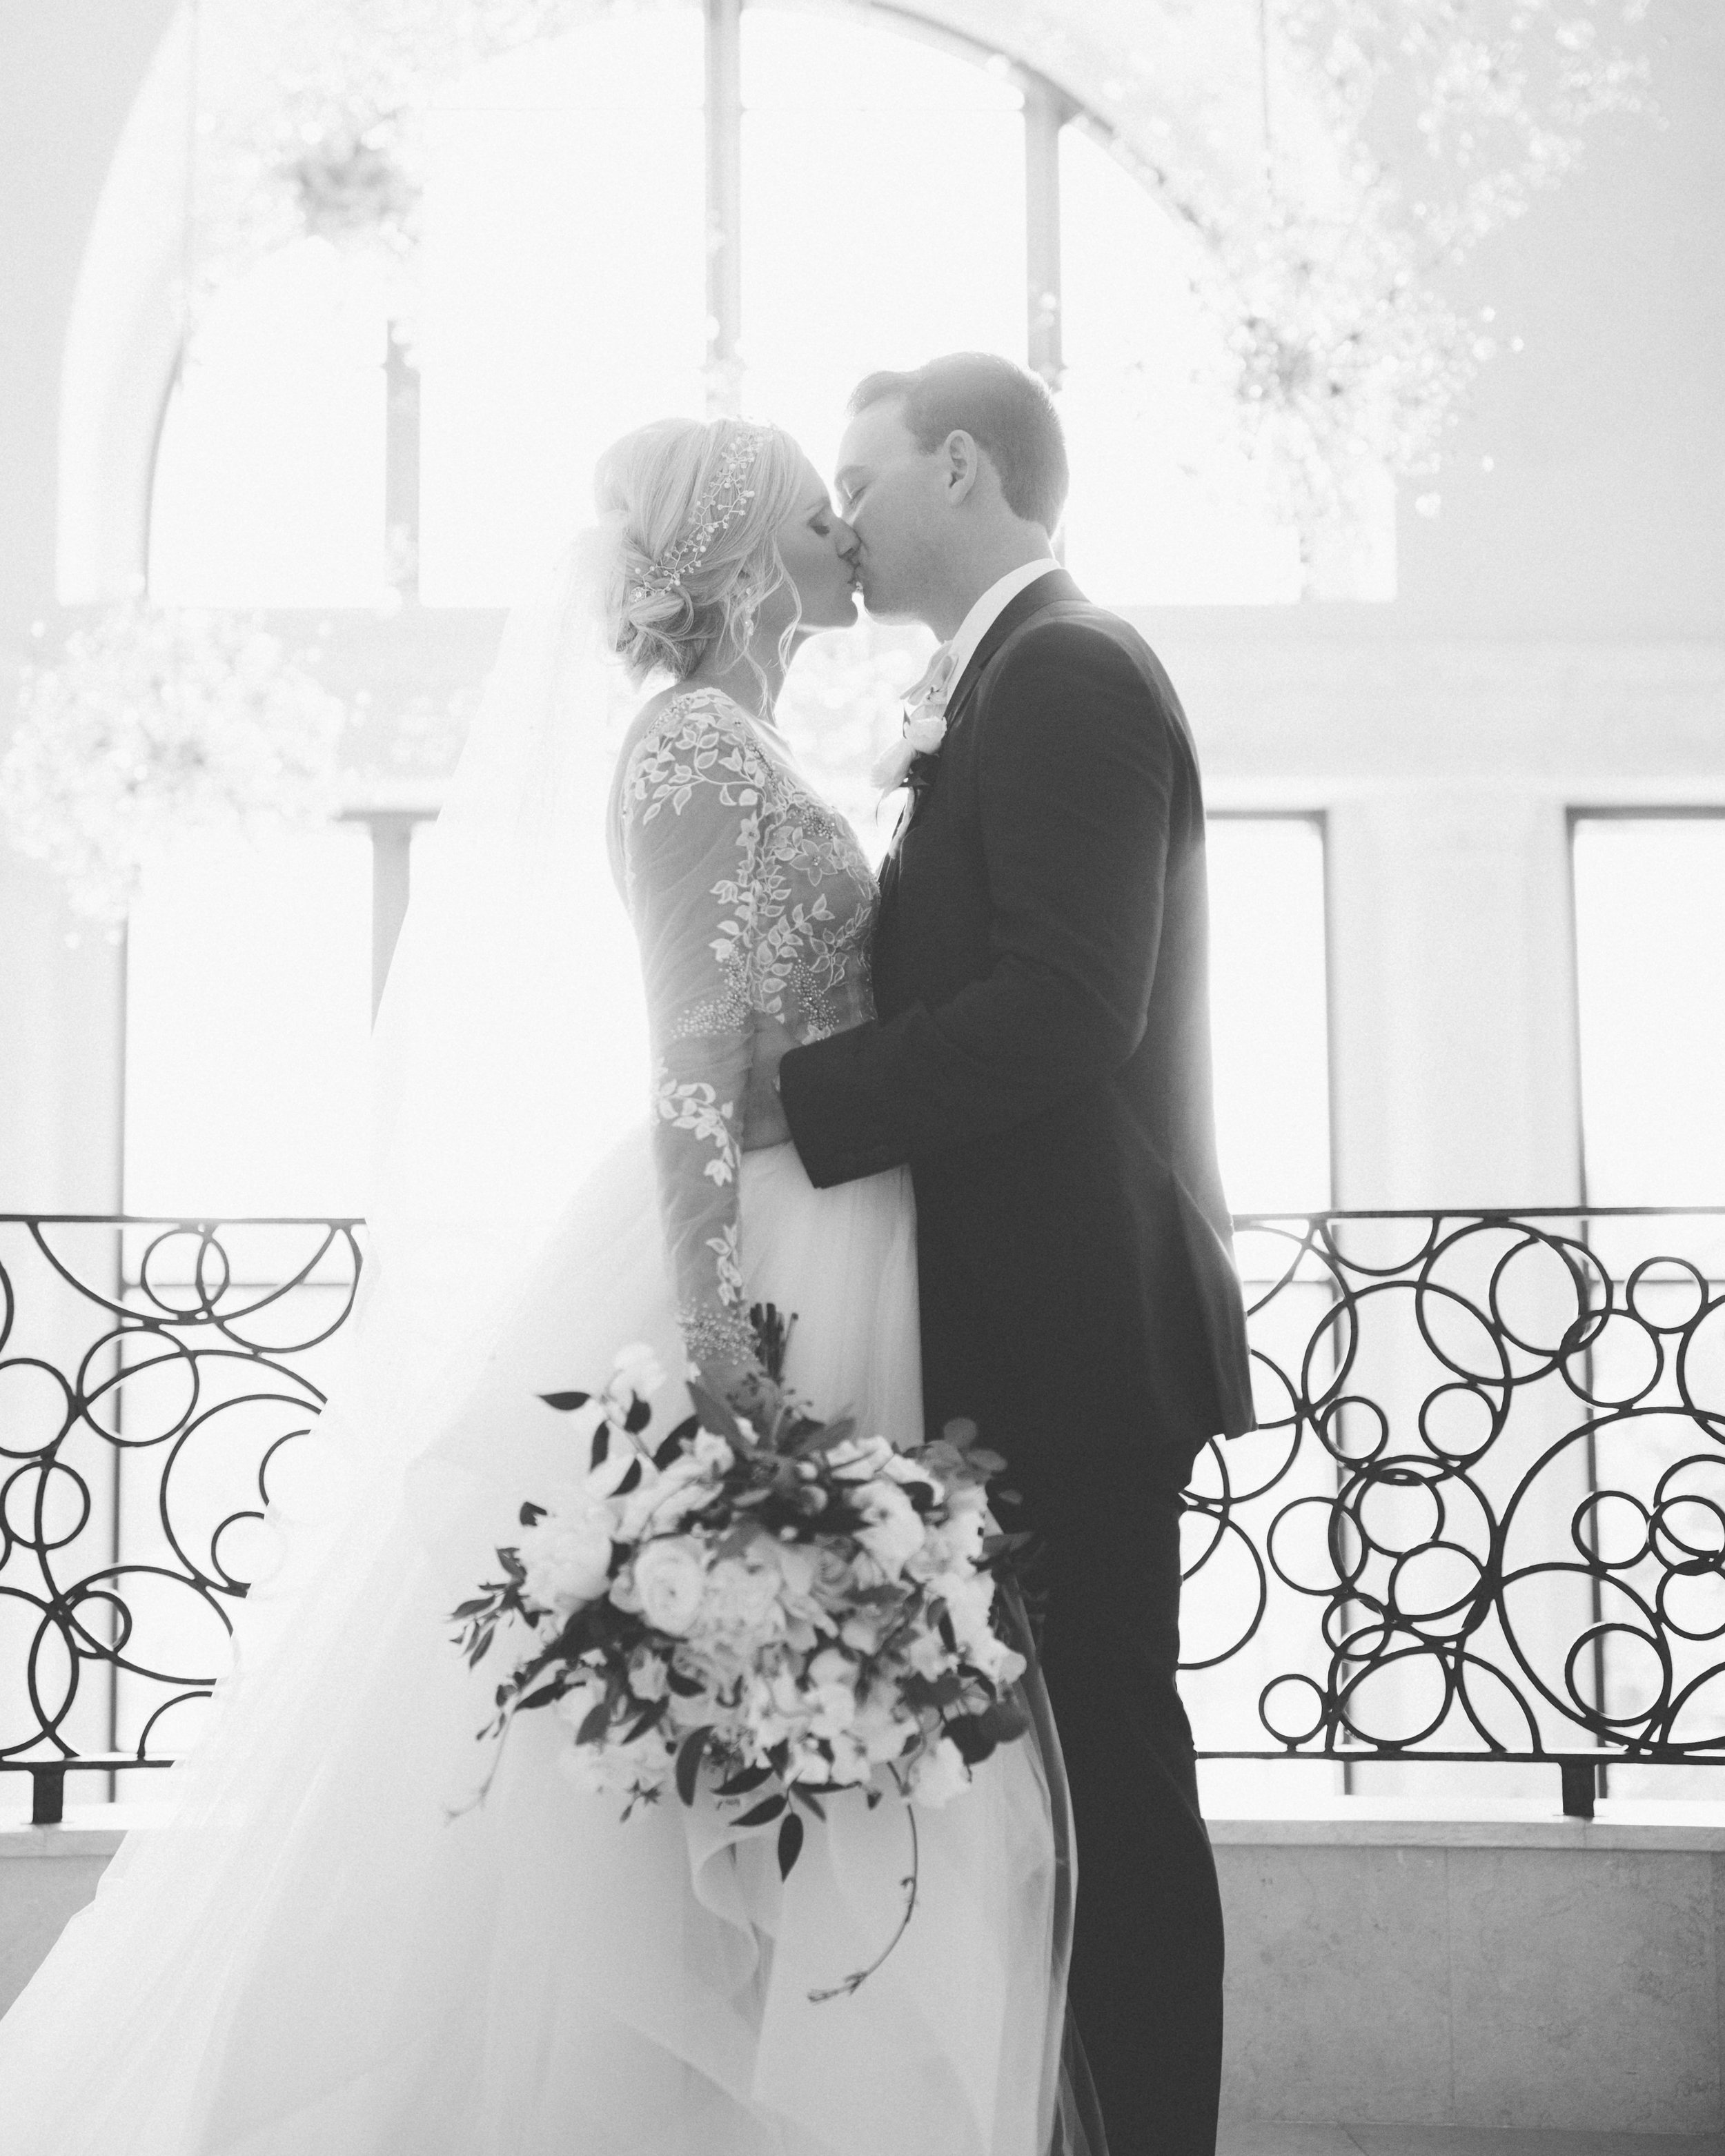 Hayley Paige fairytale bride and groom at Four Seasons Orlando